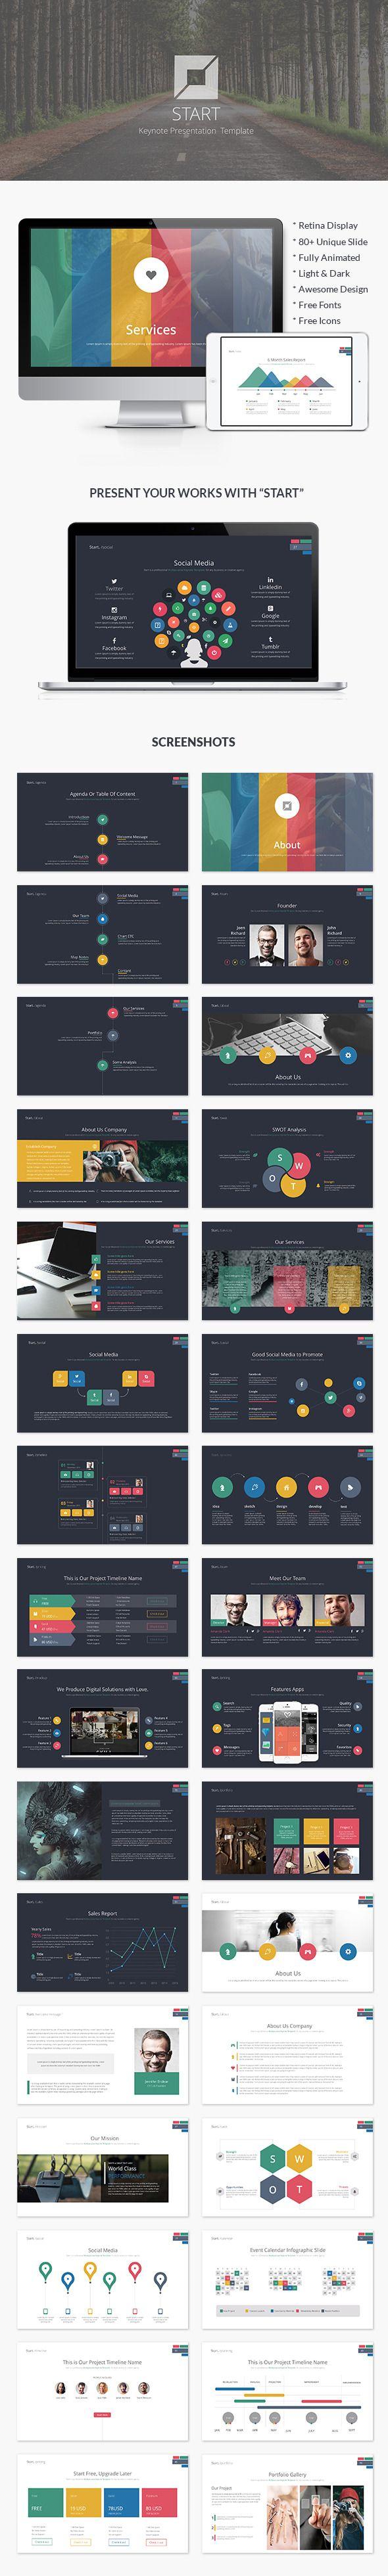 Start | Business Keynote Template #design #slides Download: http://graphicriver.net/item/start-business-keynote-template/12756280?ref=ksioks